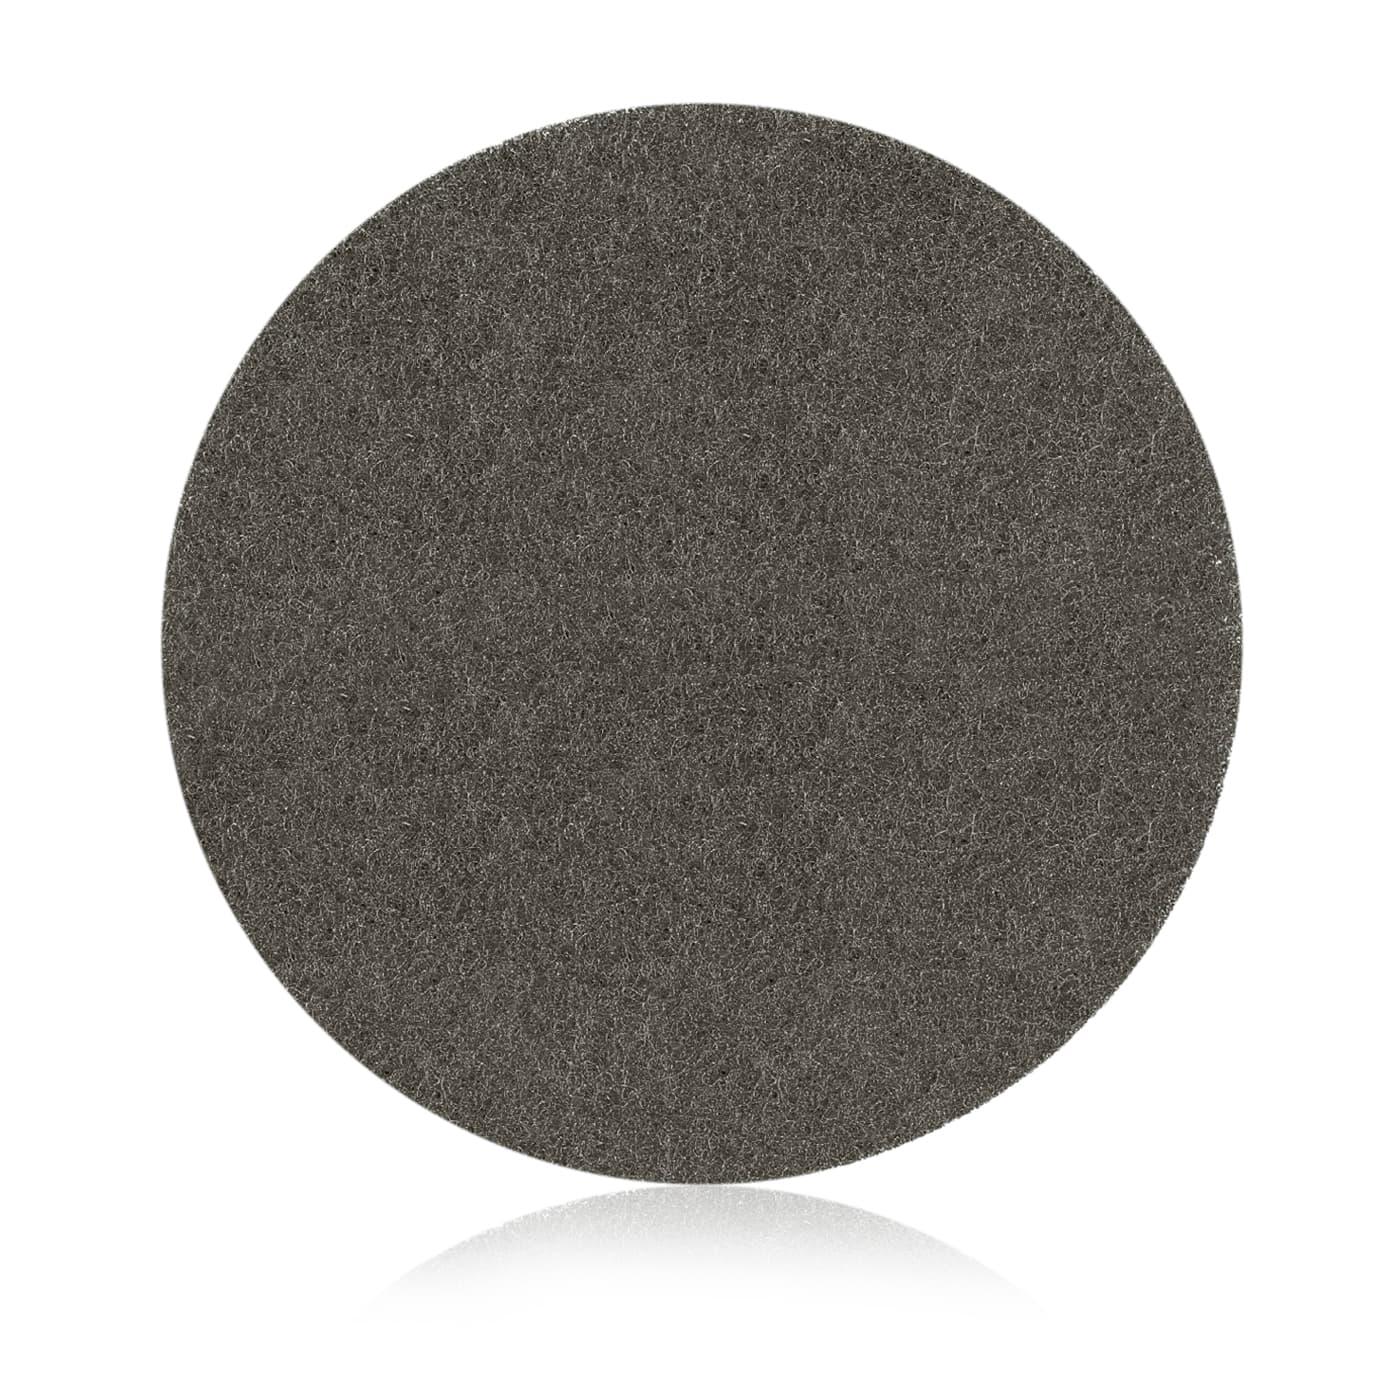 smirdex-925-none-wooven-discs